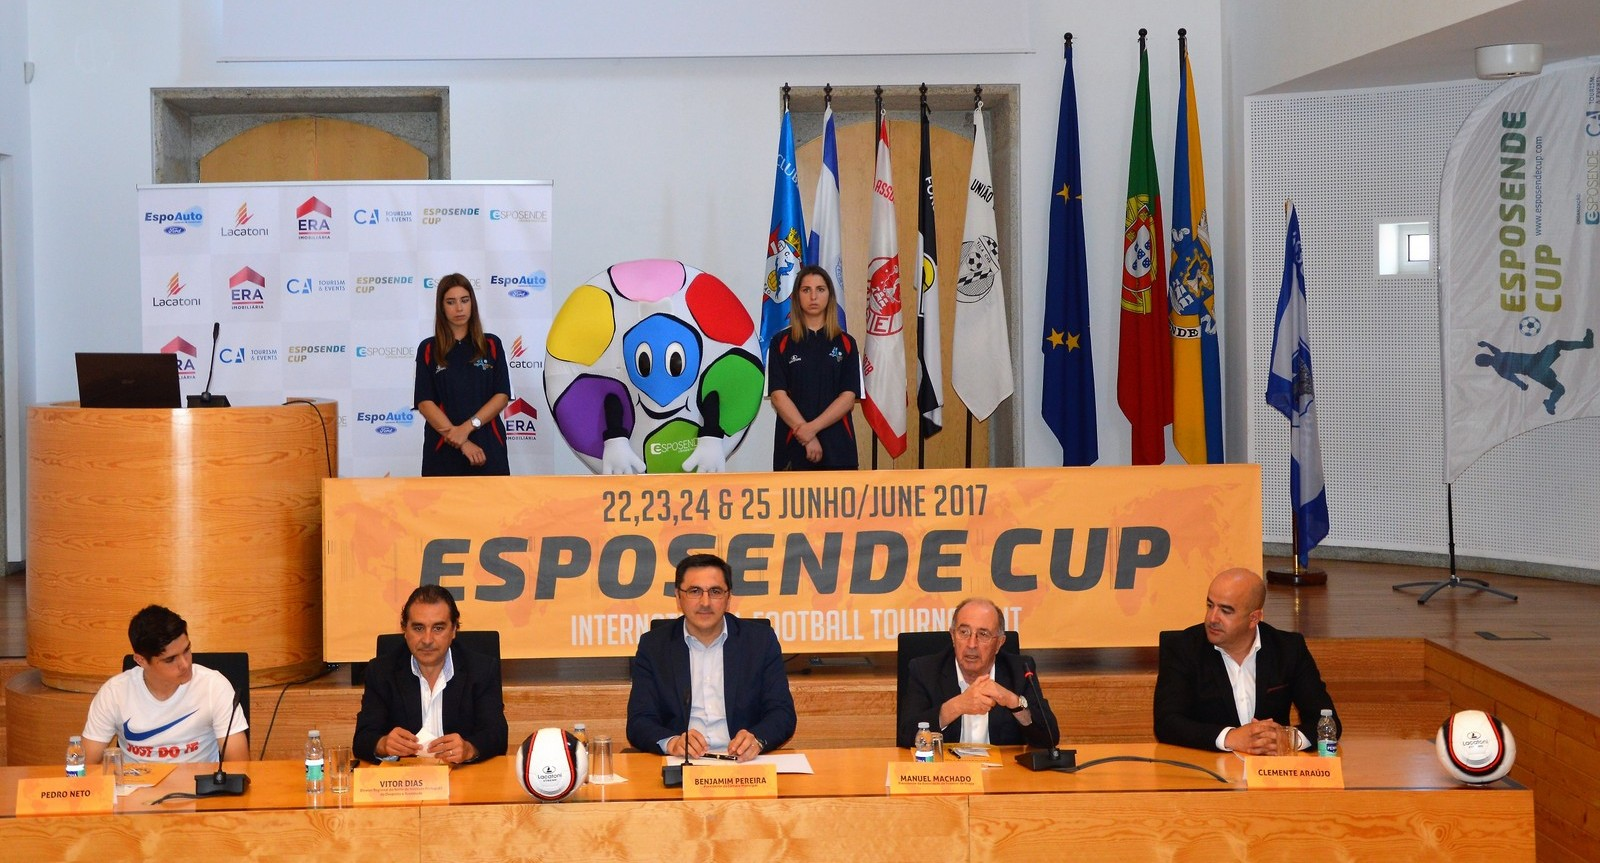 III Esposende Cup será disputado por 100  equipas de 7 países